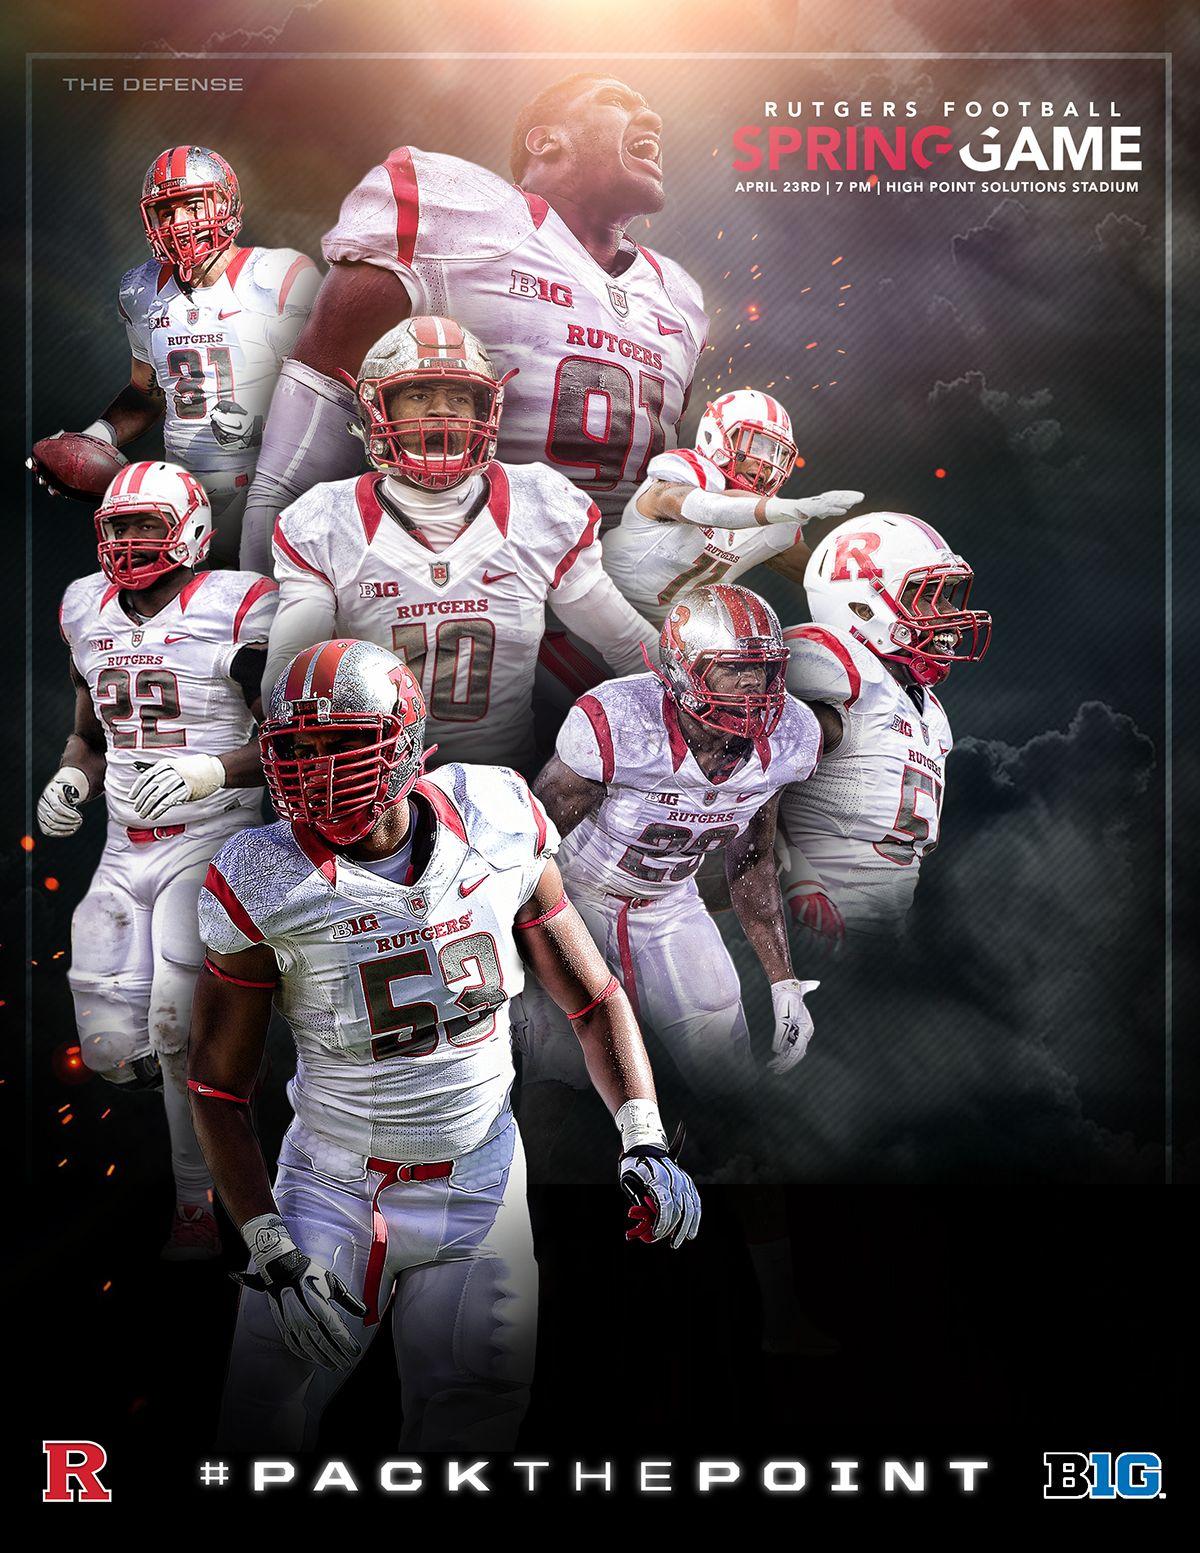 Rutgers Fb Spring Game Promo On Behance Spring Football Spring Games Rutgers Football